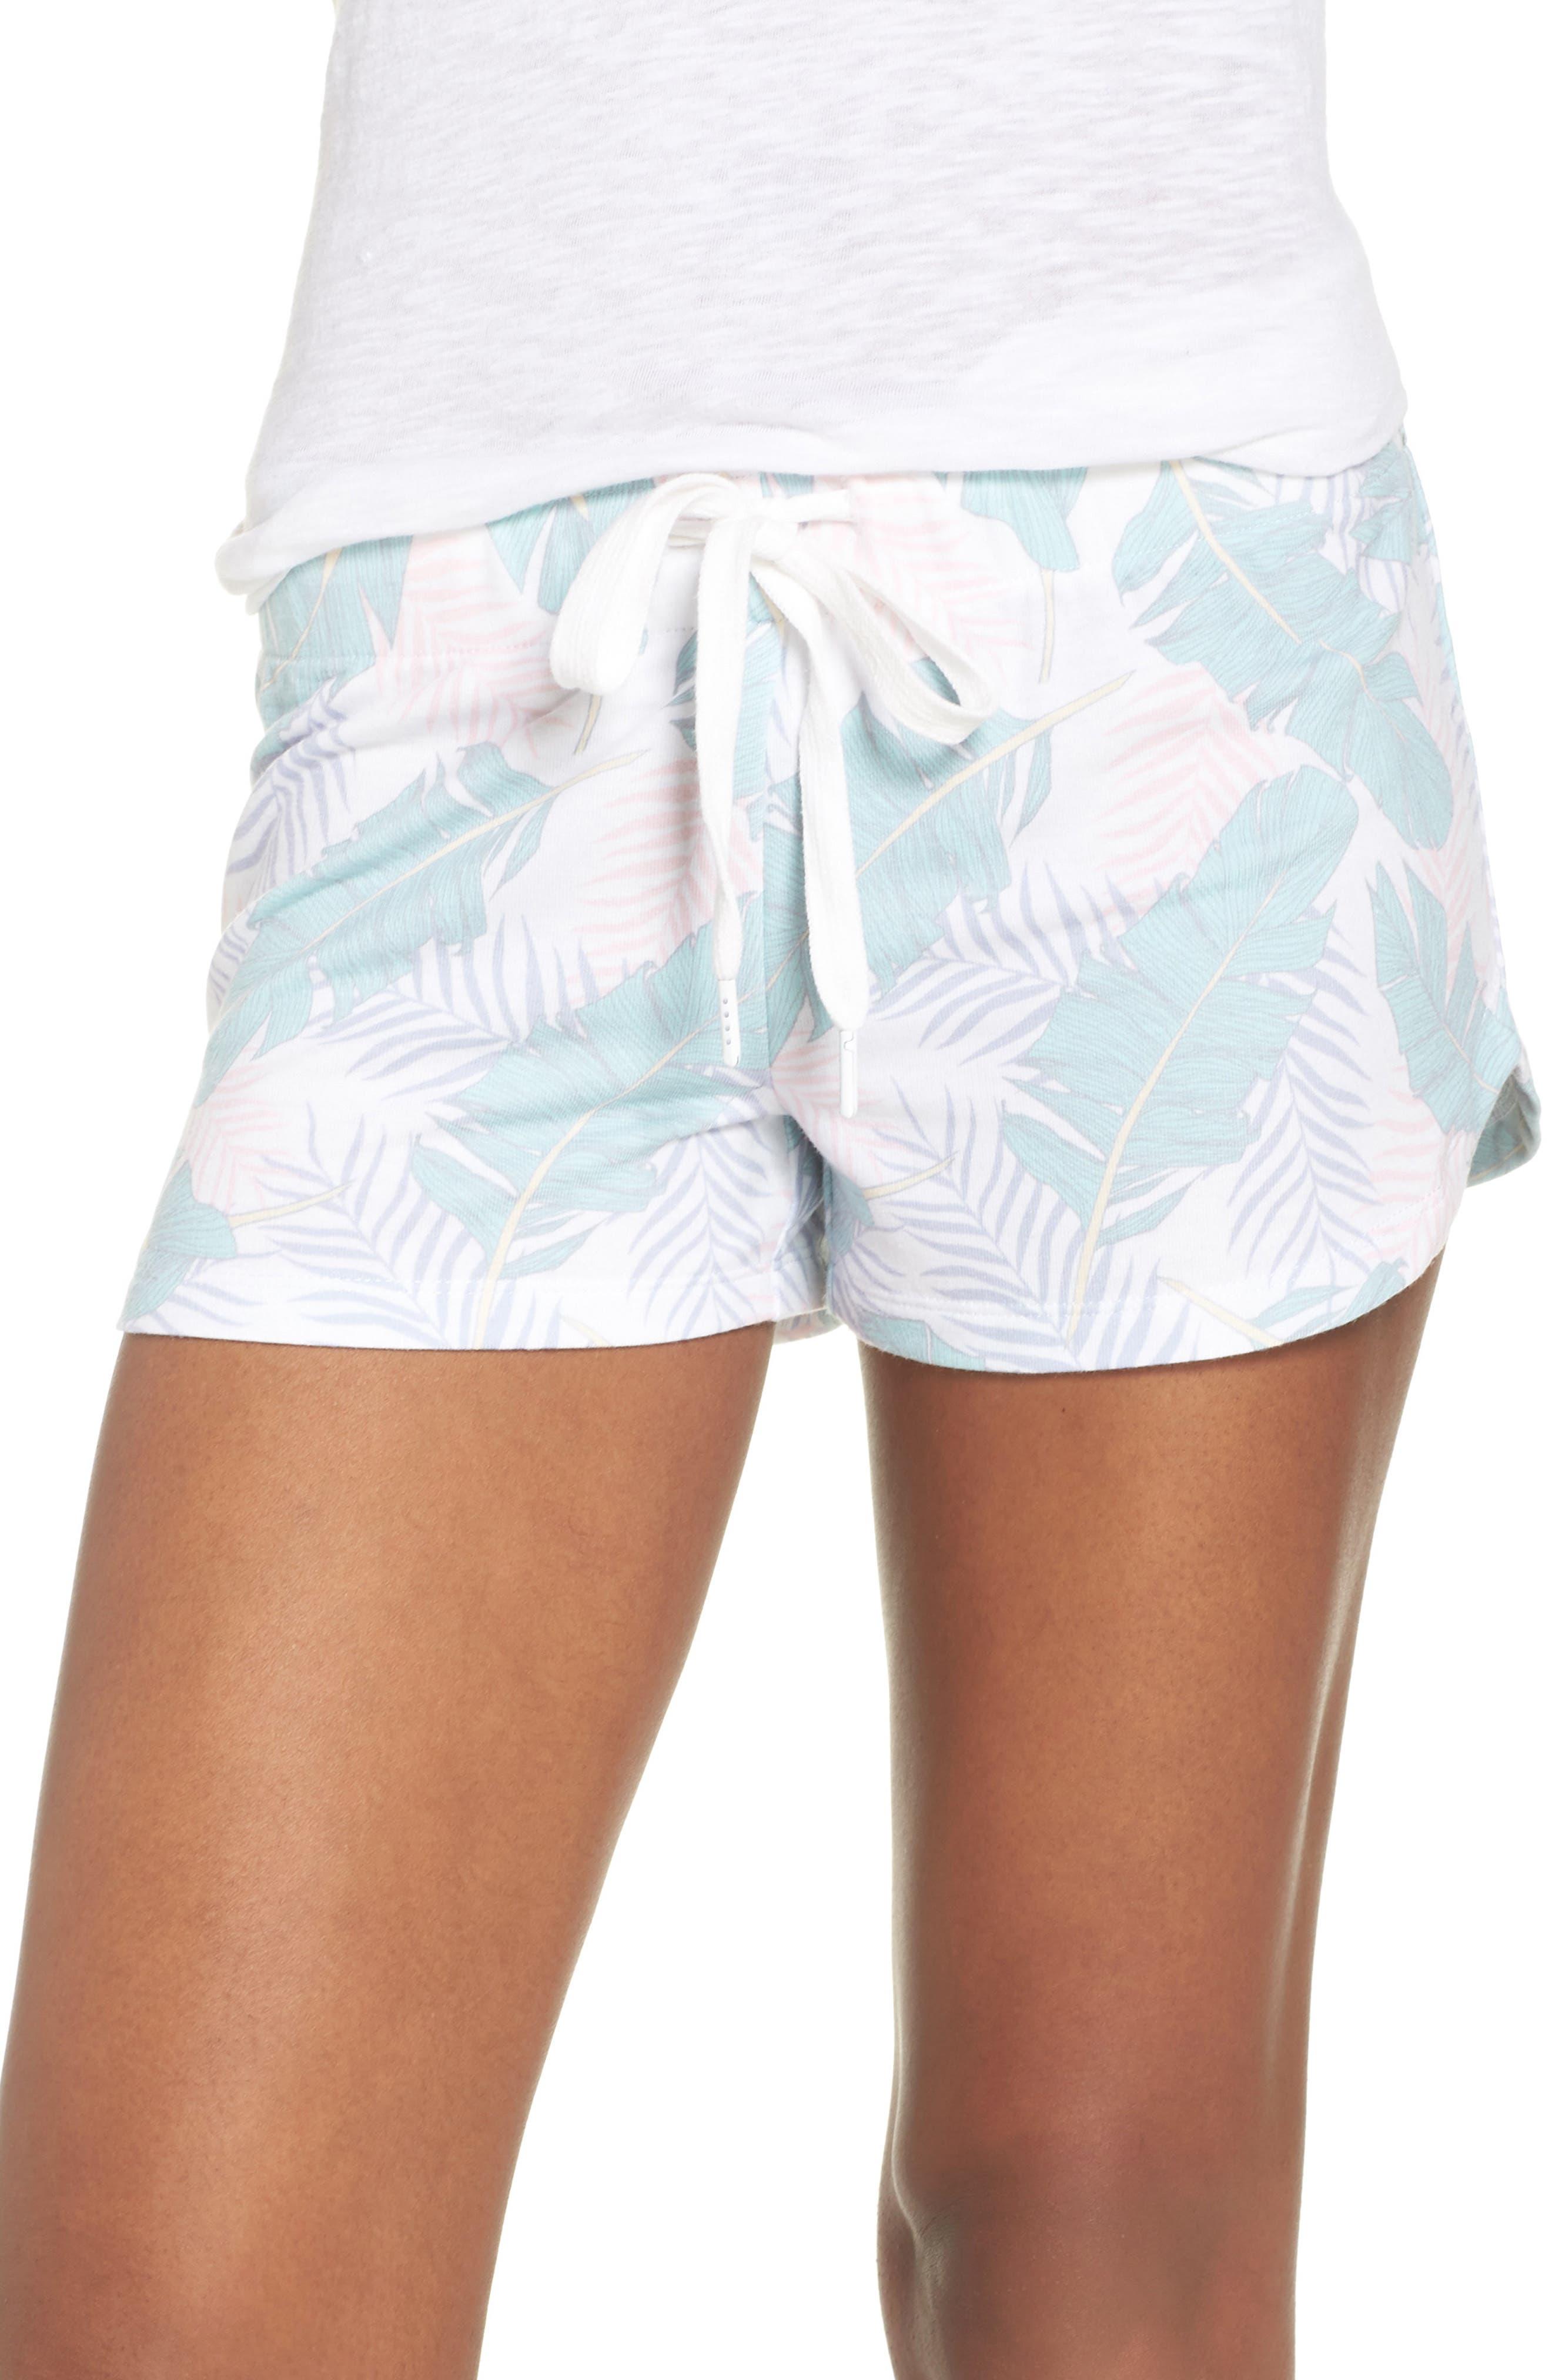 Lounge Shorts,                         Main,                         color, 100